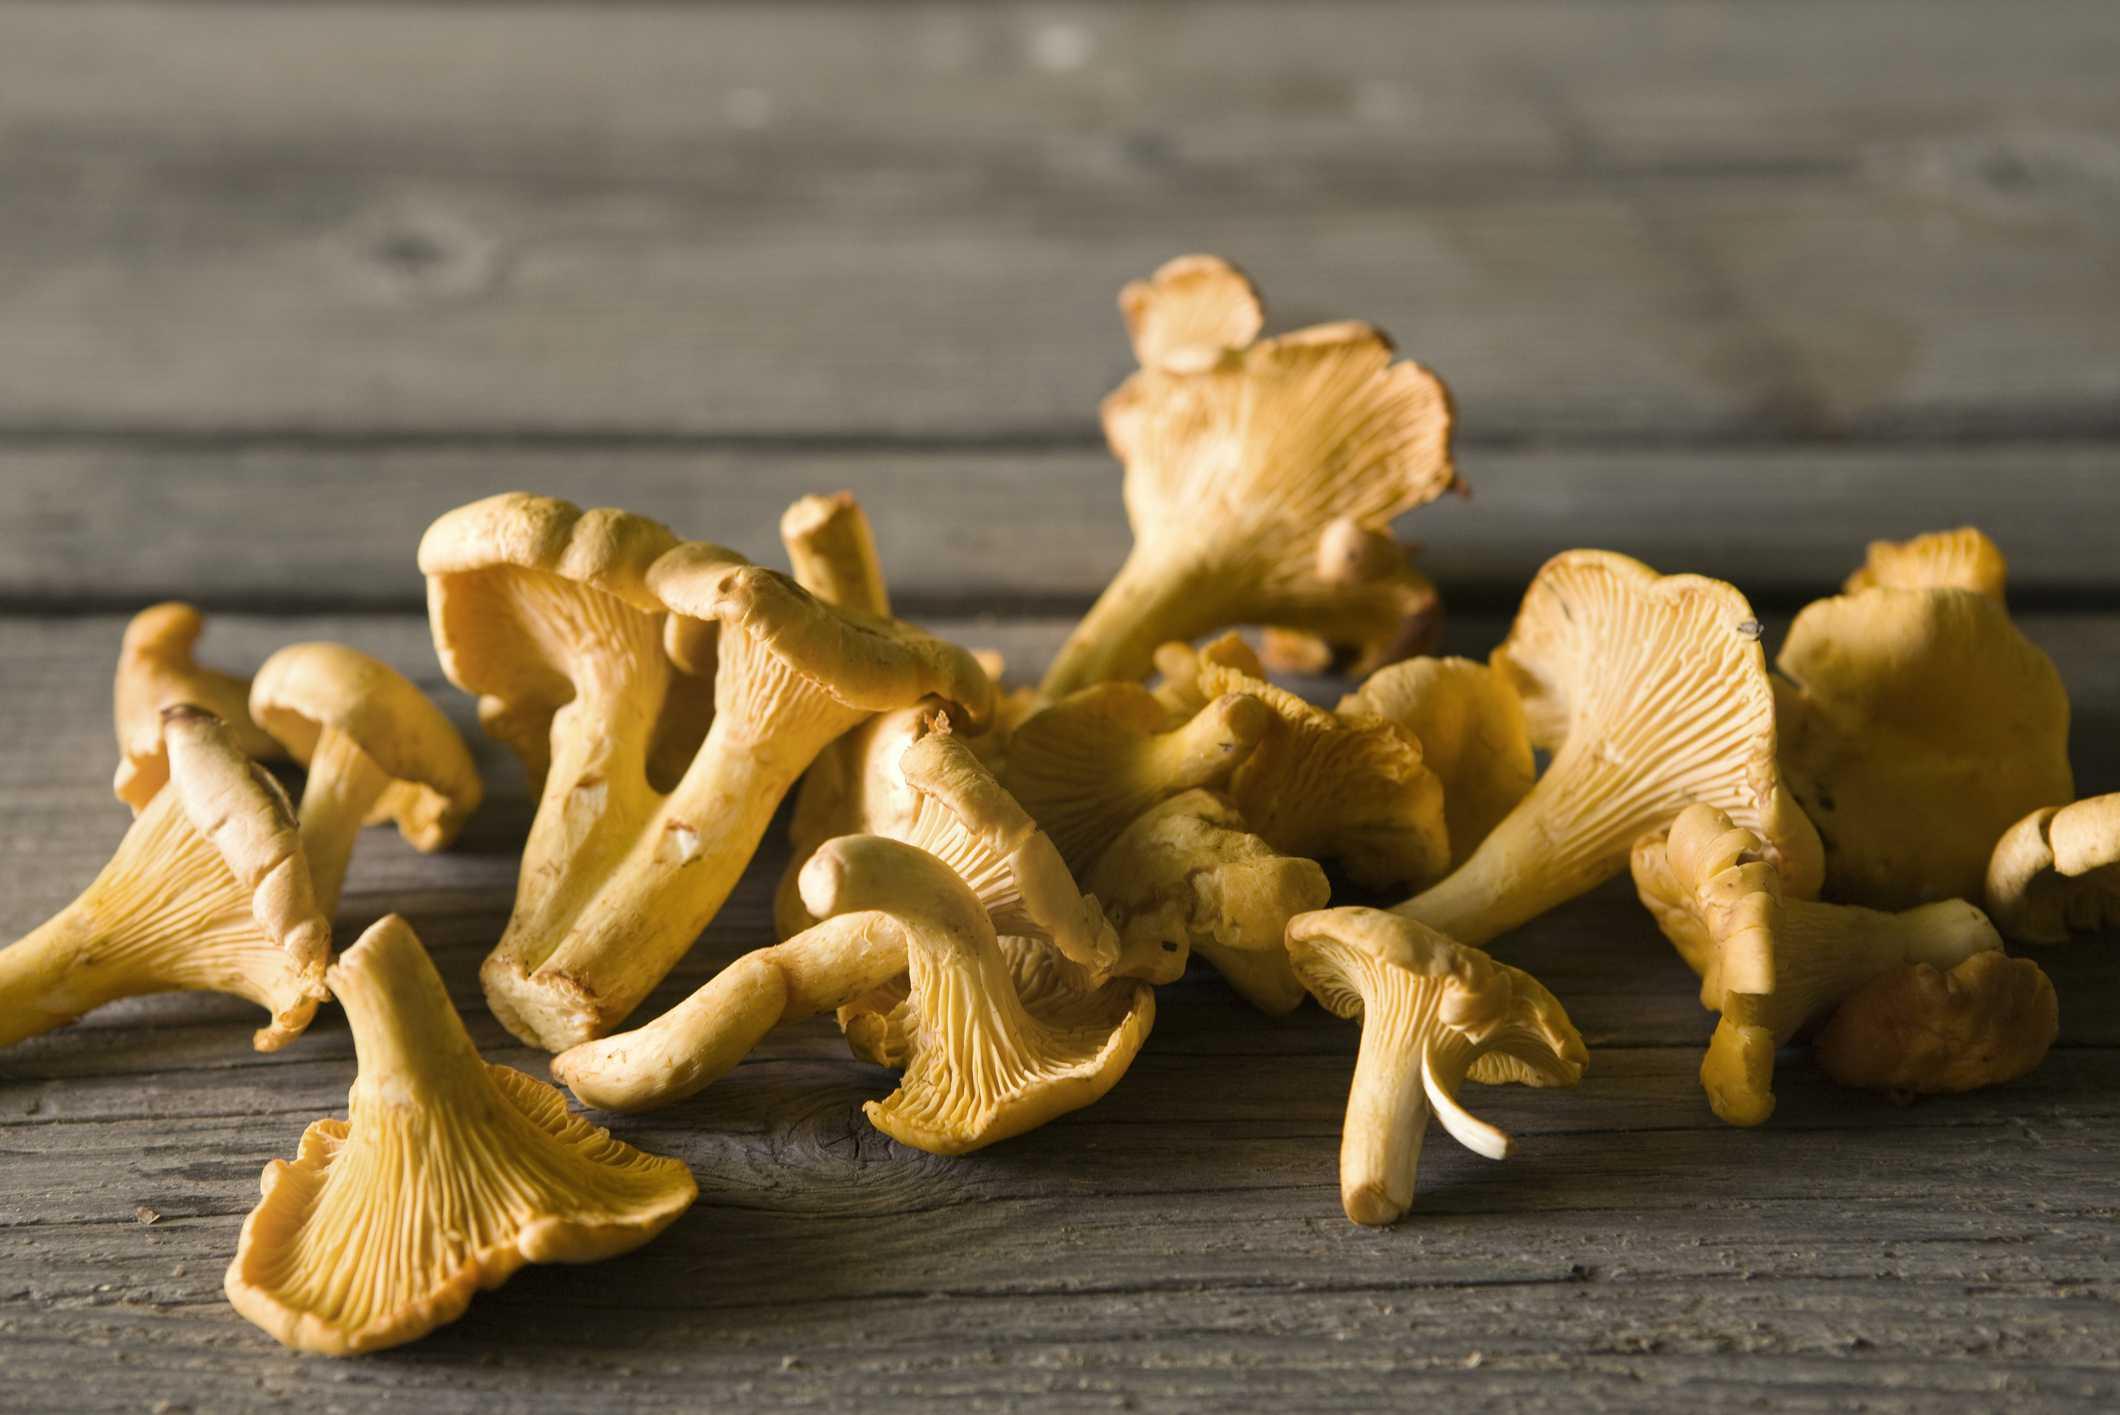 Chanterelle wild mushrooms